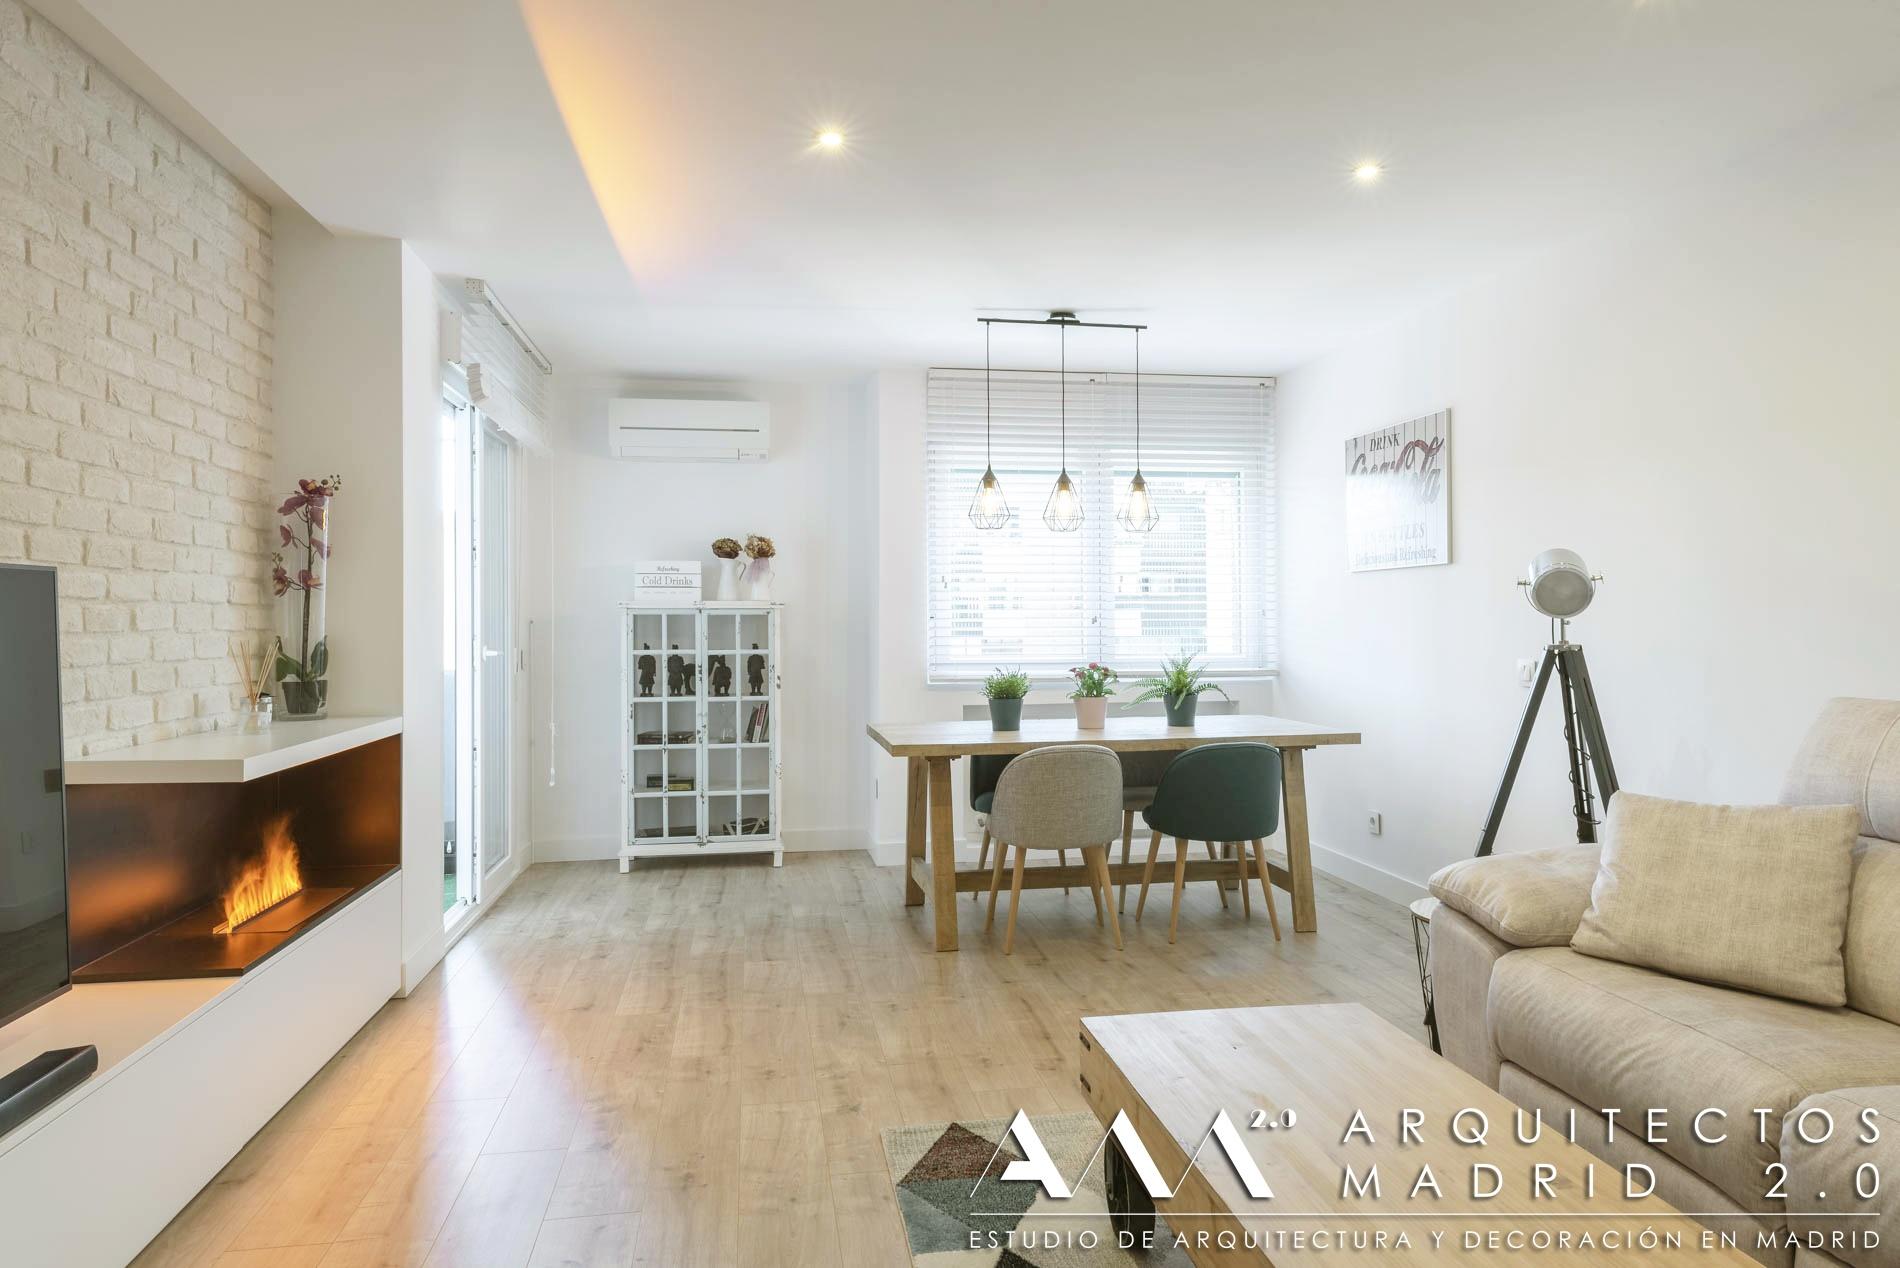 reforma-vivienda-housing-reform-architects-design-by-arquitectos-madrid-01